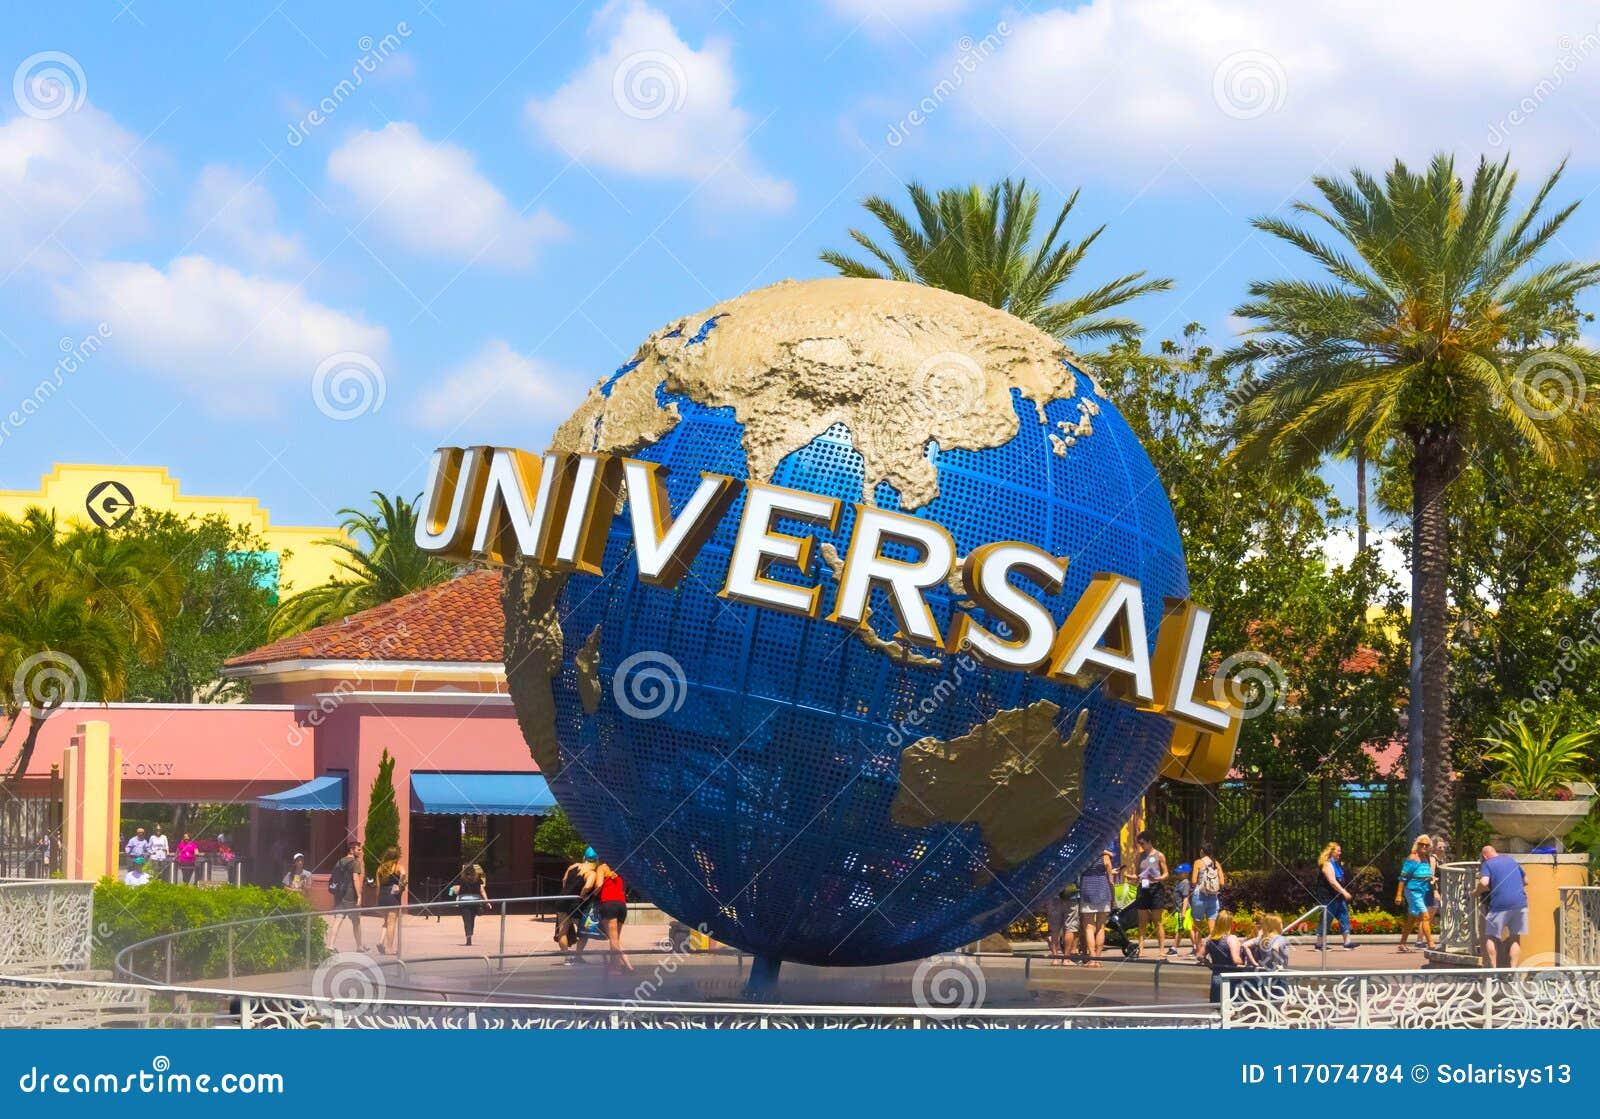 Orlando, USA - May 8, 2018: The Large Rotating Universal